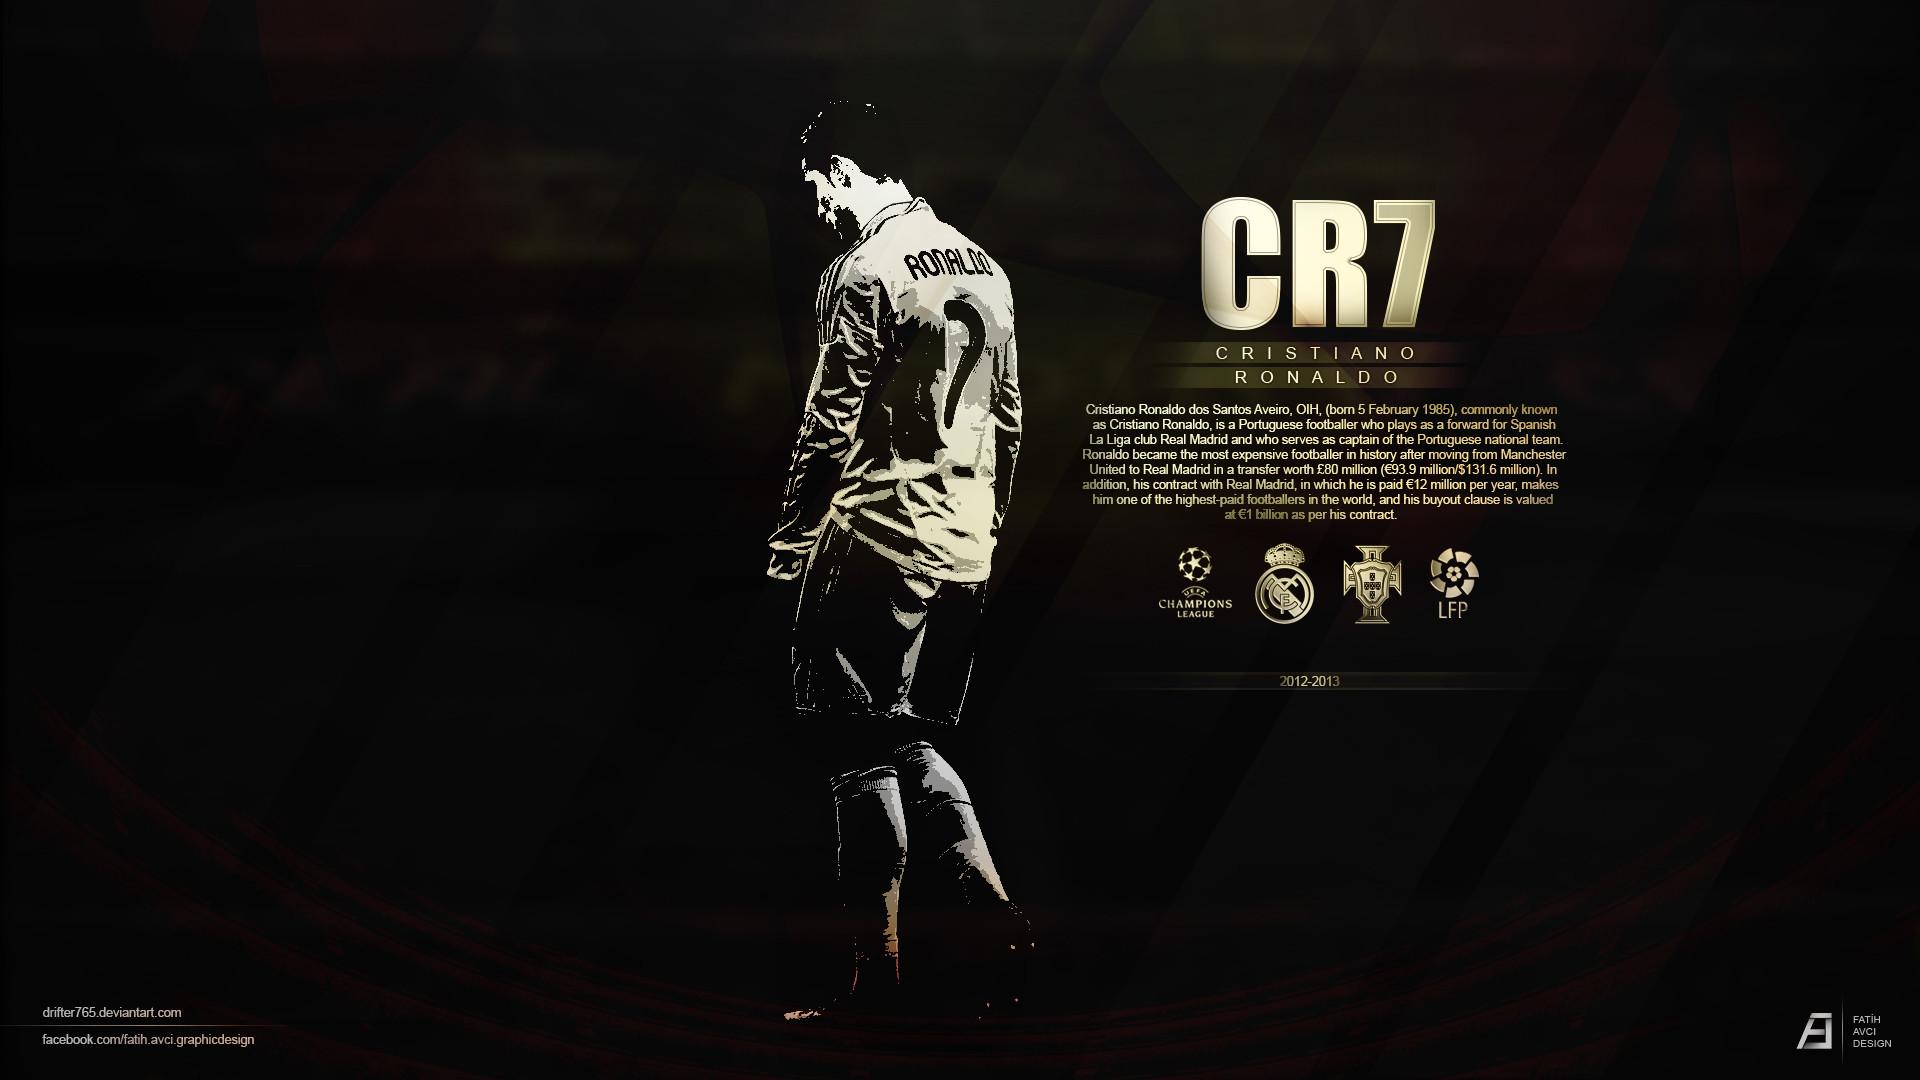 CR7 Real Madrid HD Wallpaper 5654 Wallpaper ForWallpaperscom 1920x1080